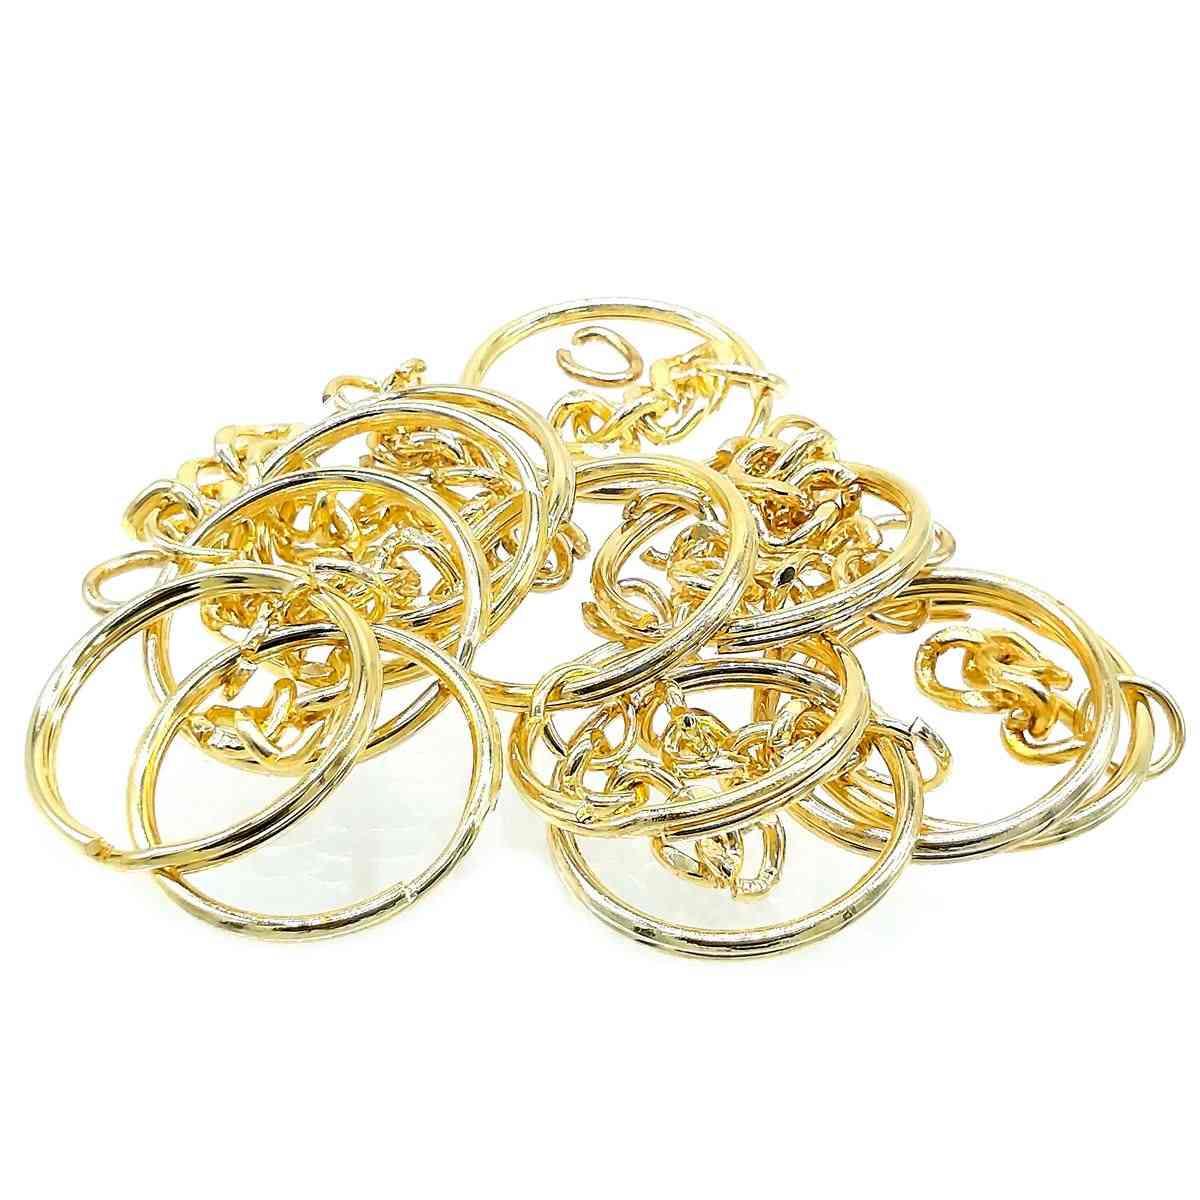 Key Chain Gold